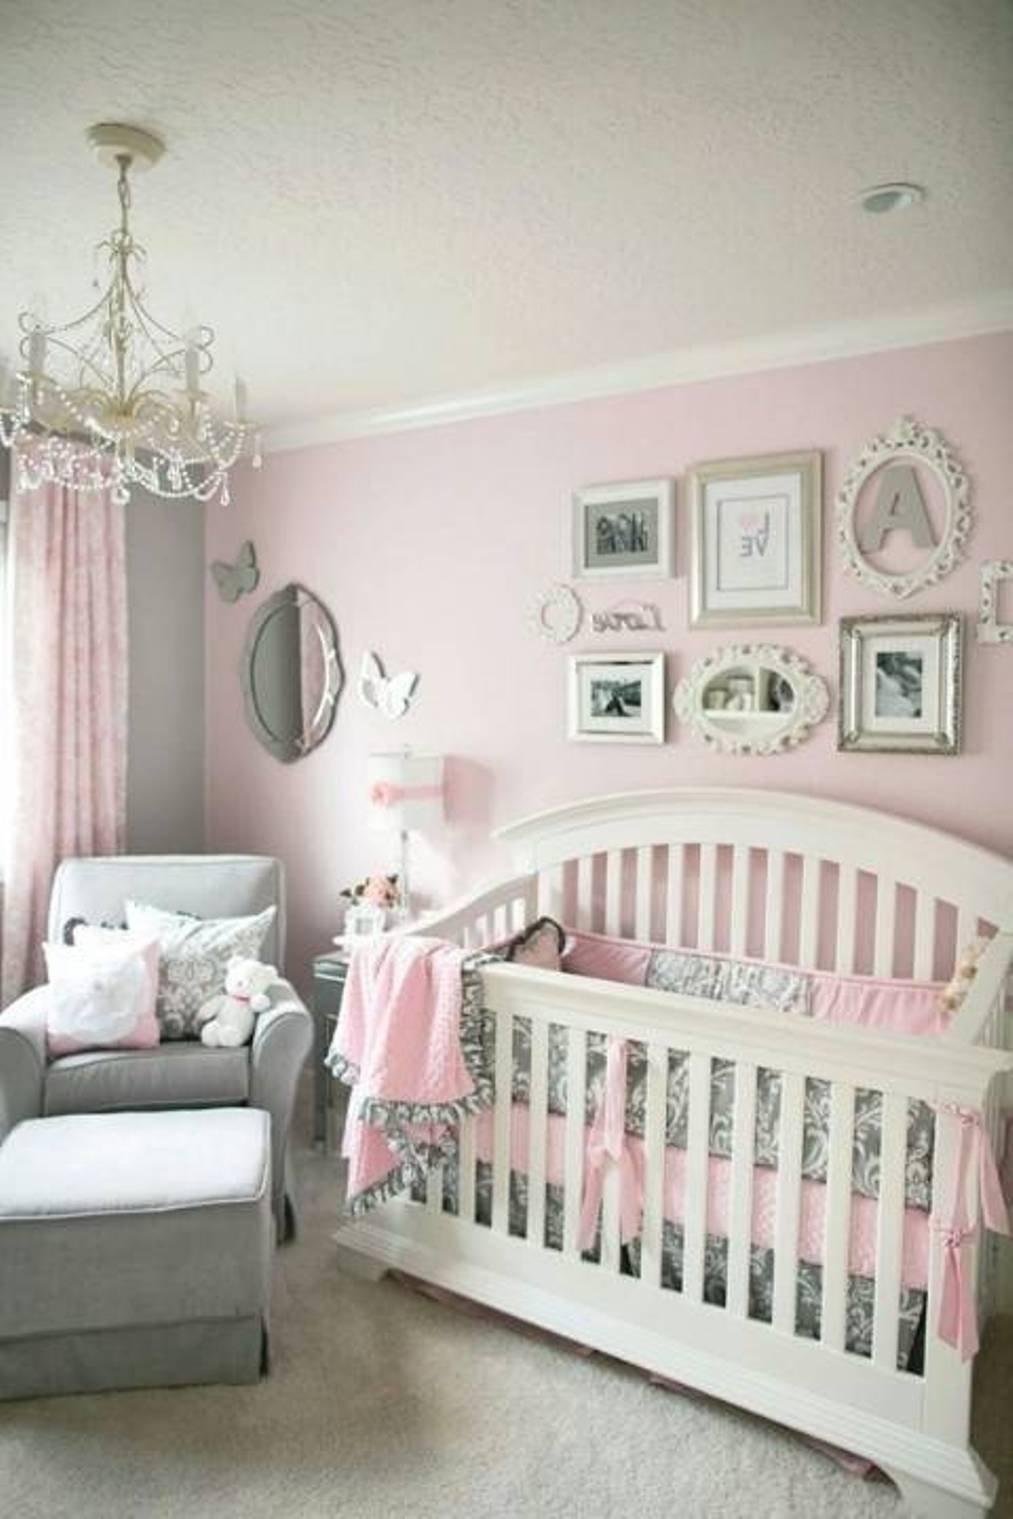 10 Wonderful Baby Girl Nursery Decorating Ideas decorating ideas for baby girl nursery wall decor editeestrela 1 2020